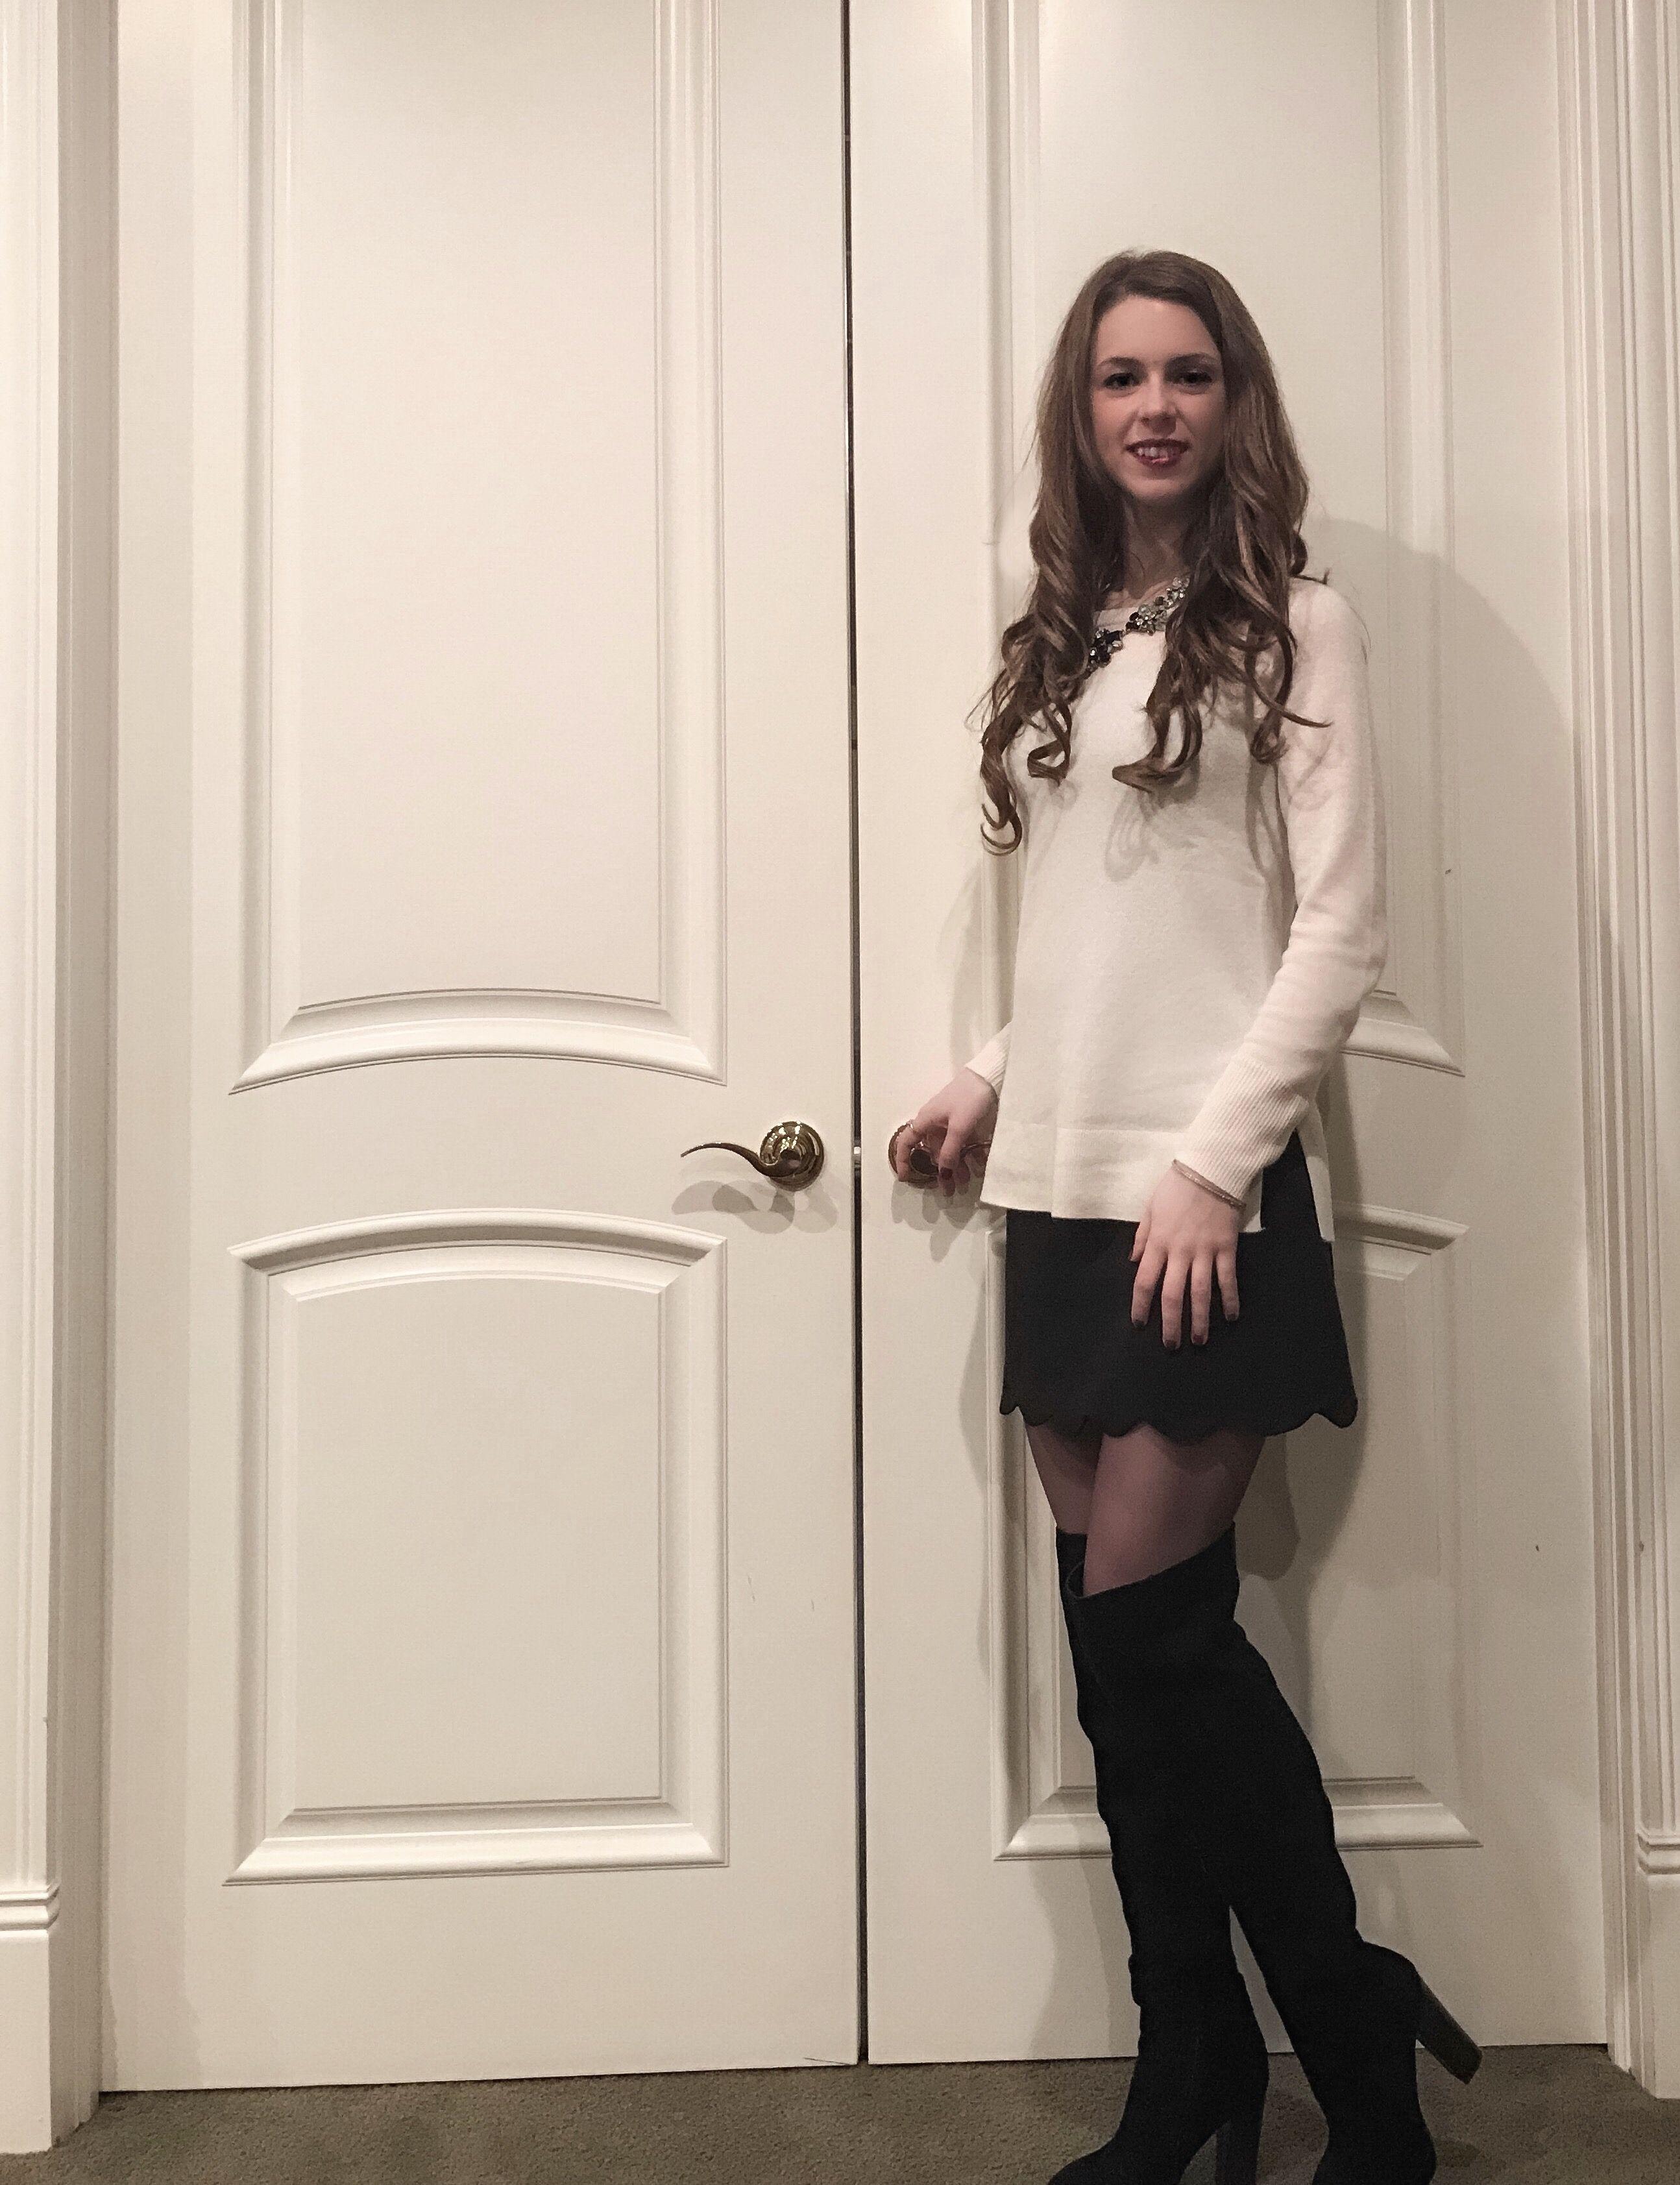 Veronika simon wearing a sexy outfit скачать